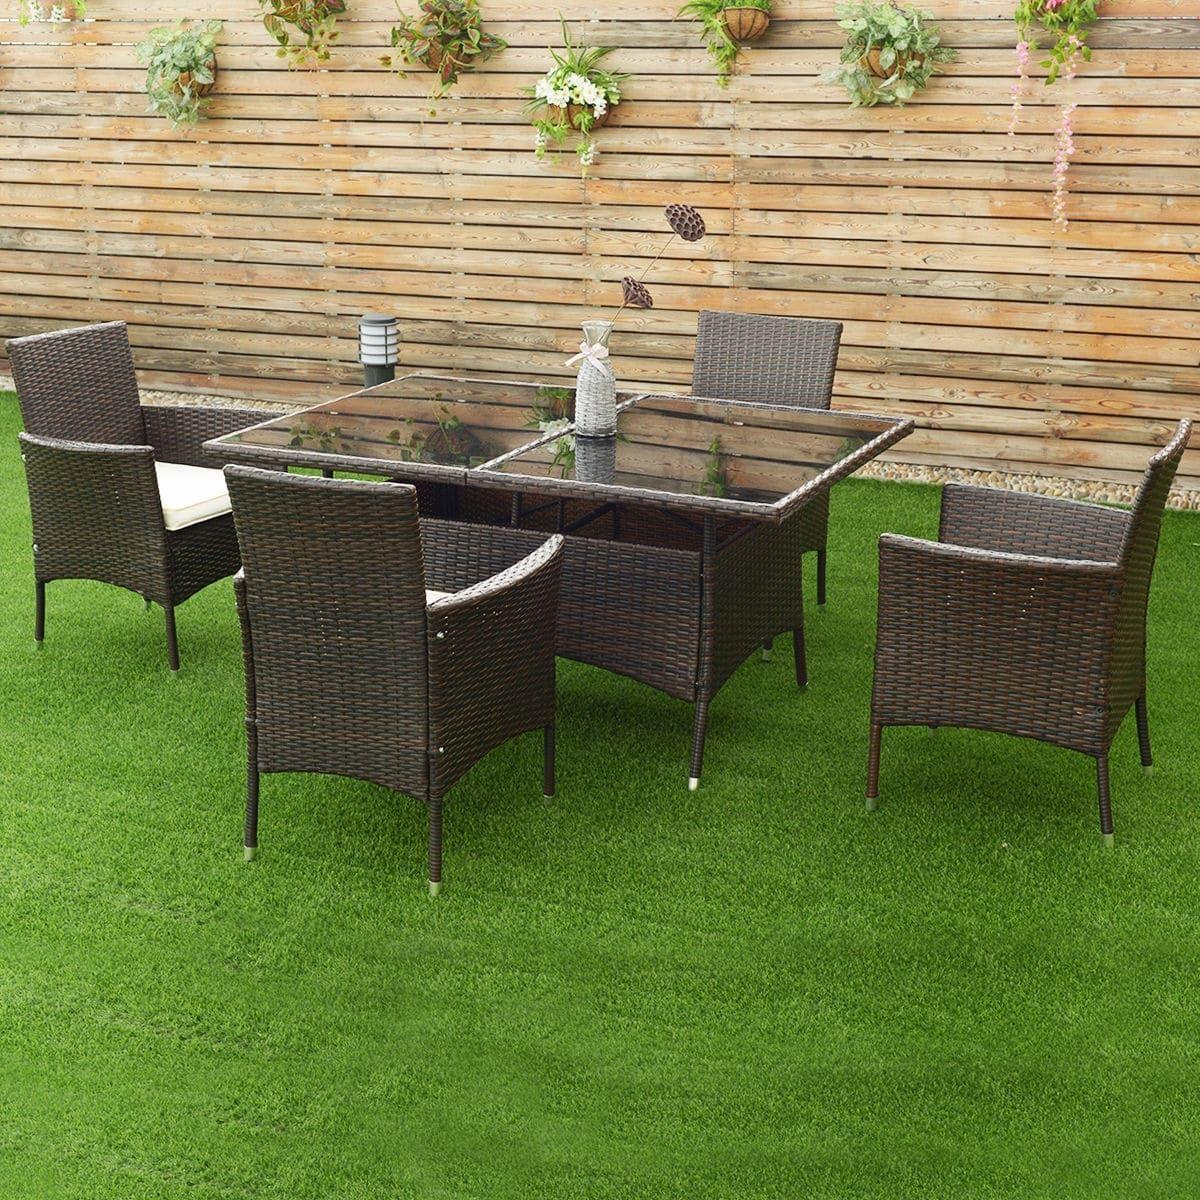 Costway pcs rattan garden sofa set outdoor patio furniture table